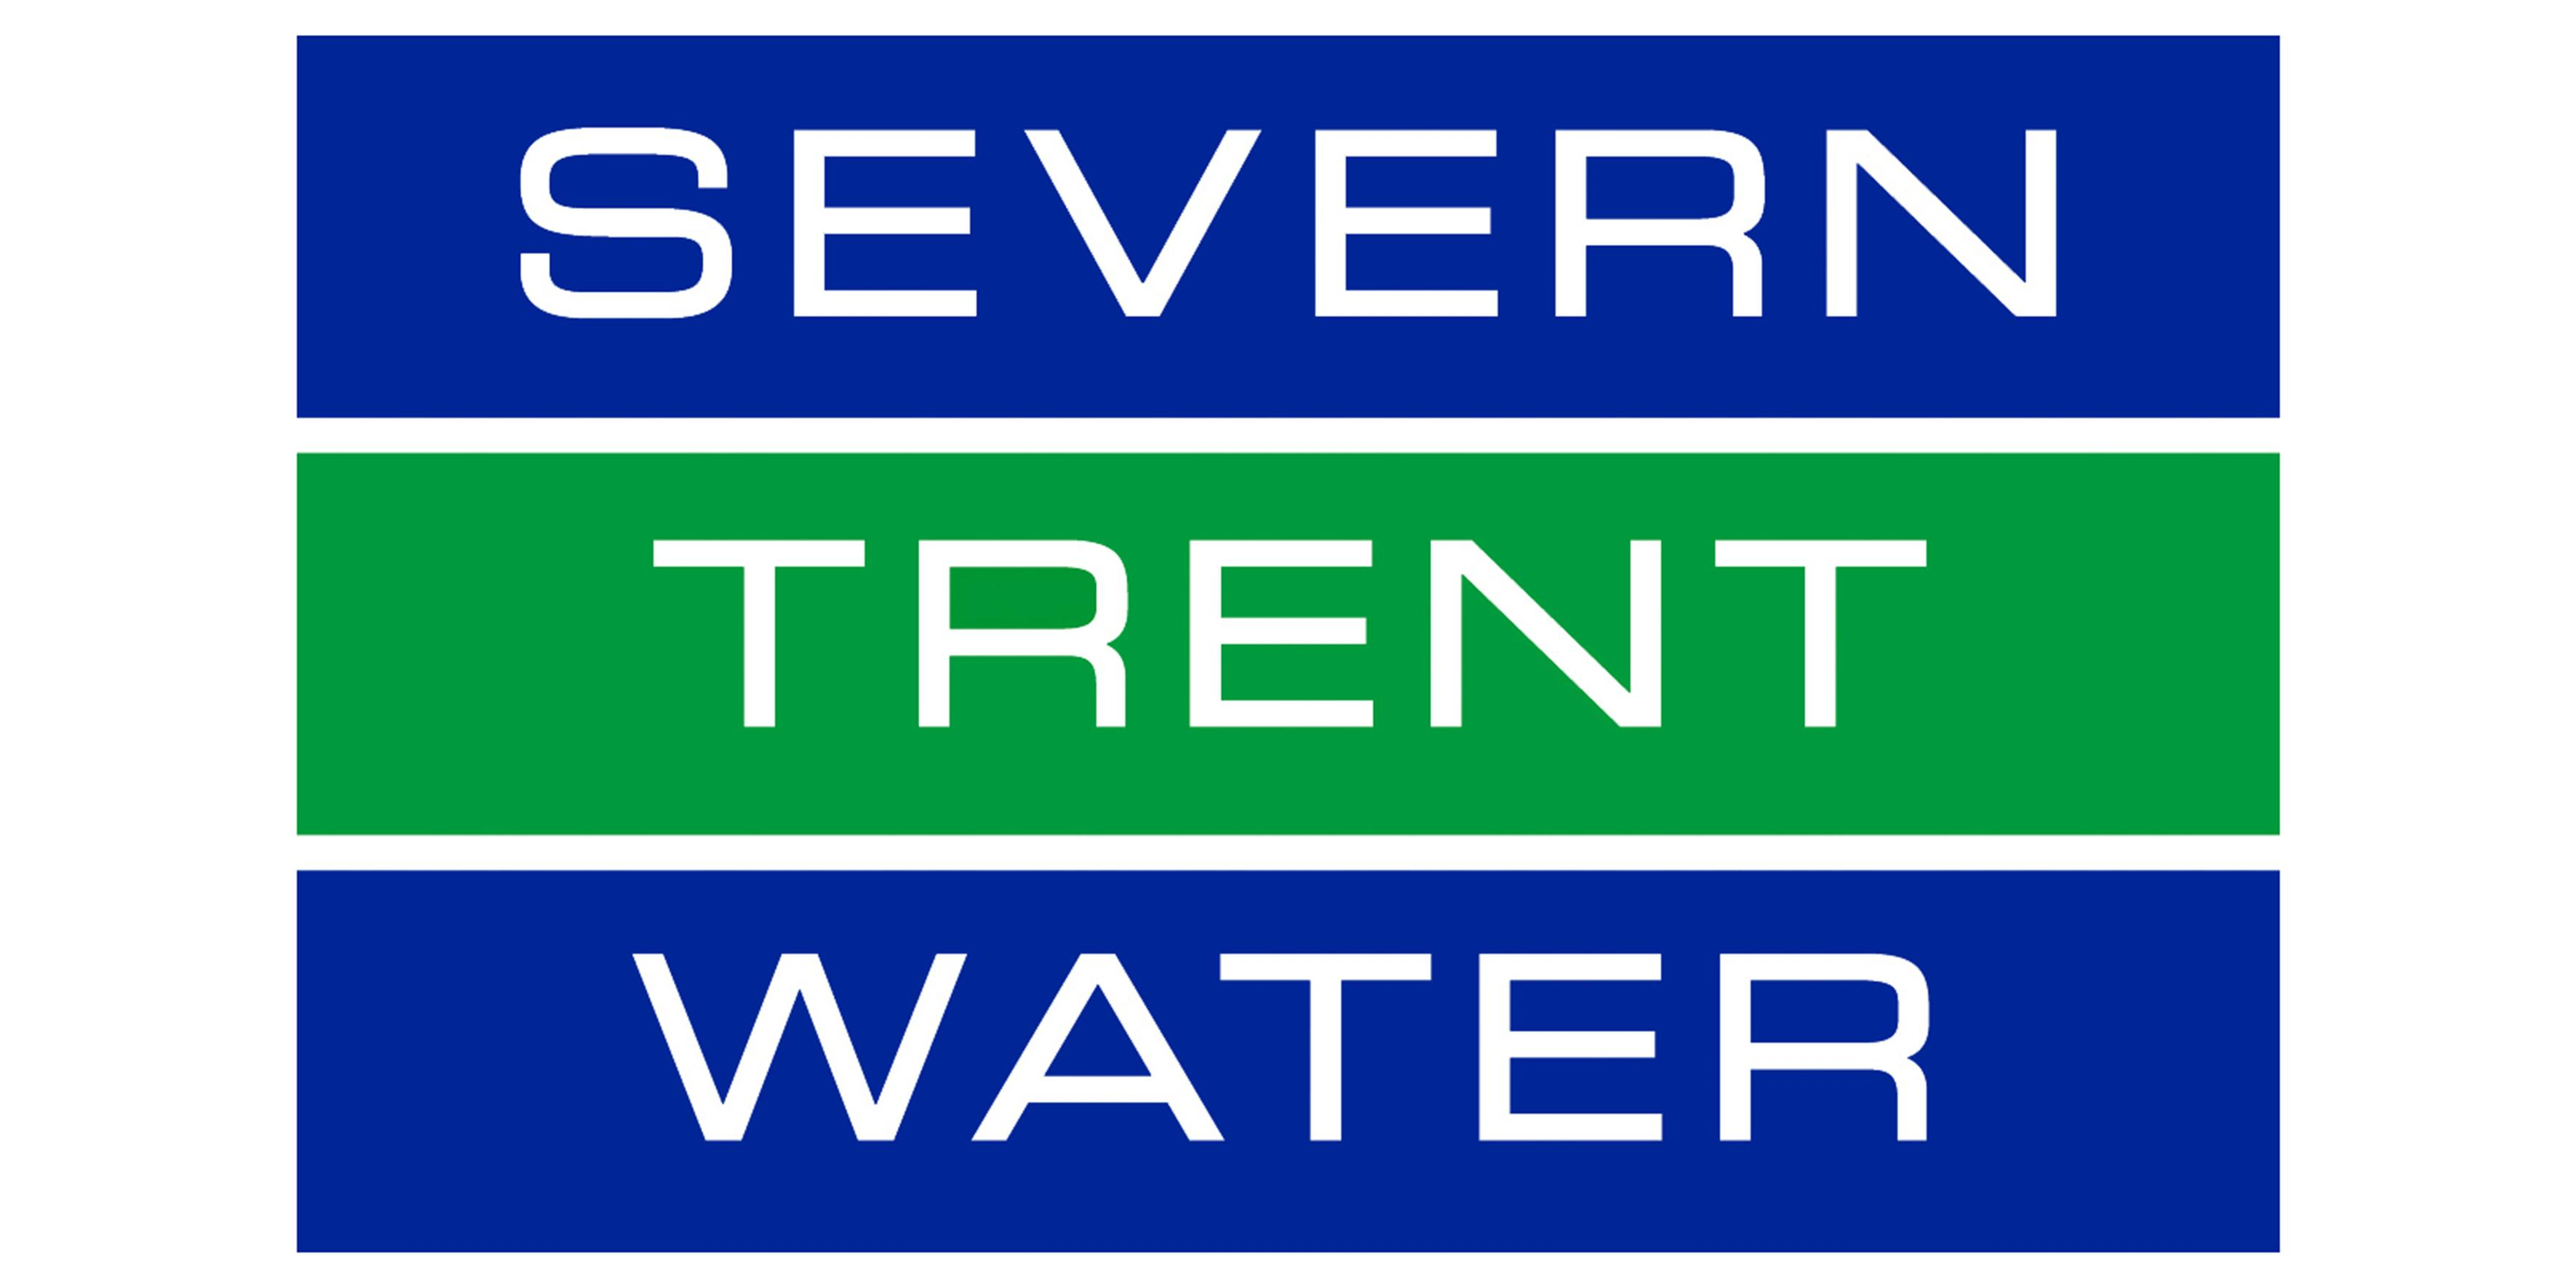 SevernTrent